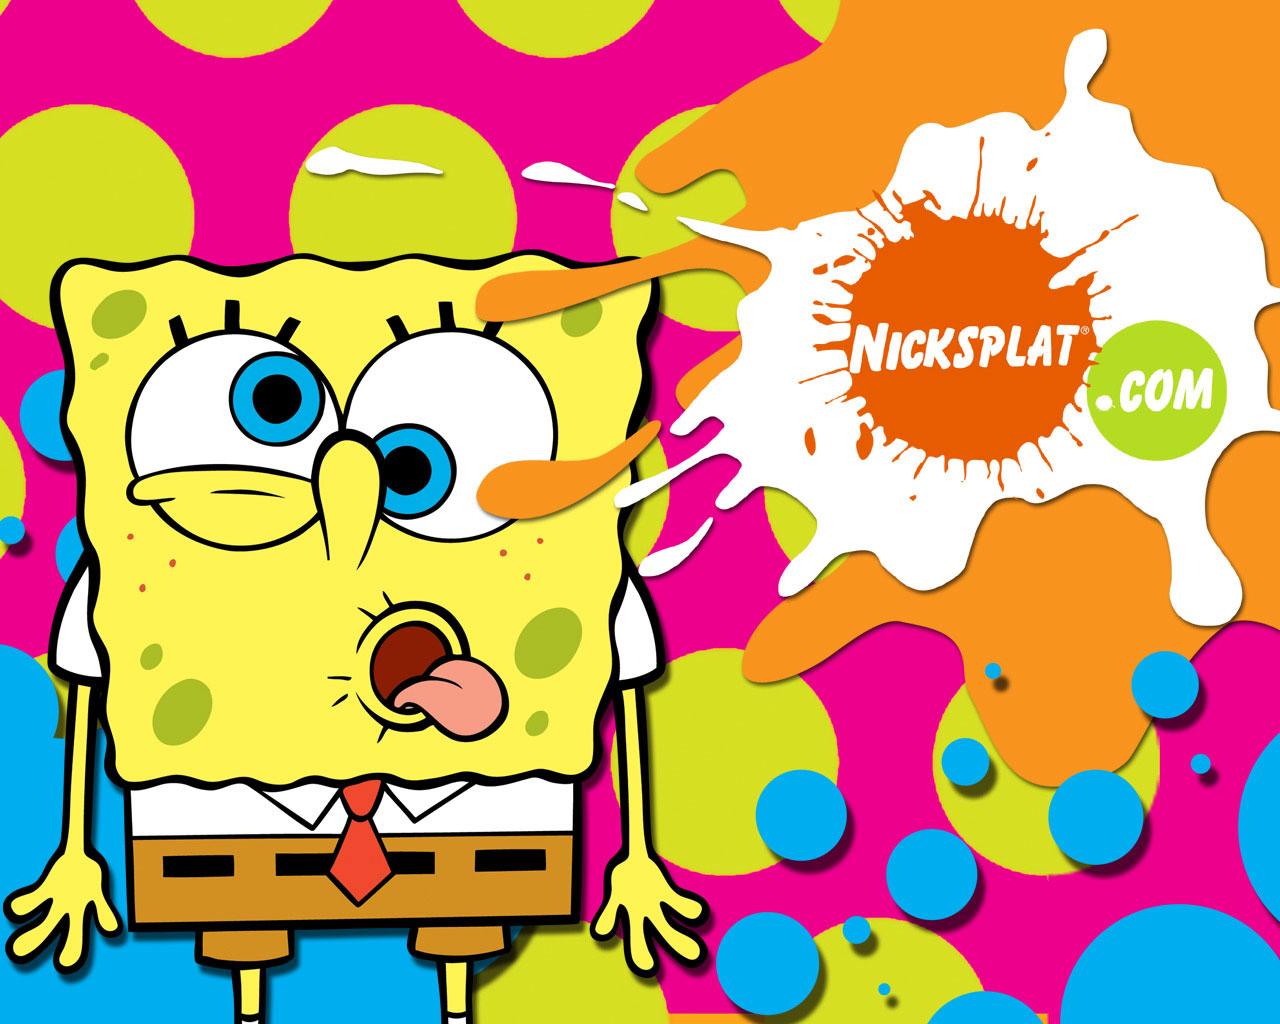 http://2.bp.blogspot.com/-Ans7f4BTeoQ/UL9EFRqRzfI/AAAAAAAAARI/QGyzccjvaFs/s1600/52007-spongebob-square-pants-spongebob-squarepants-wallpaper11.jpg